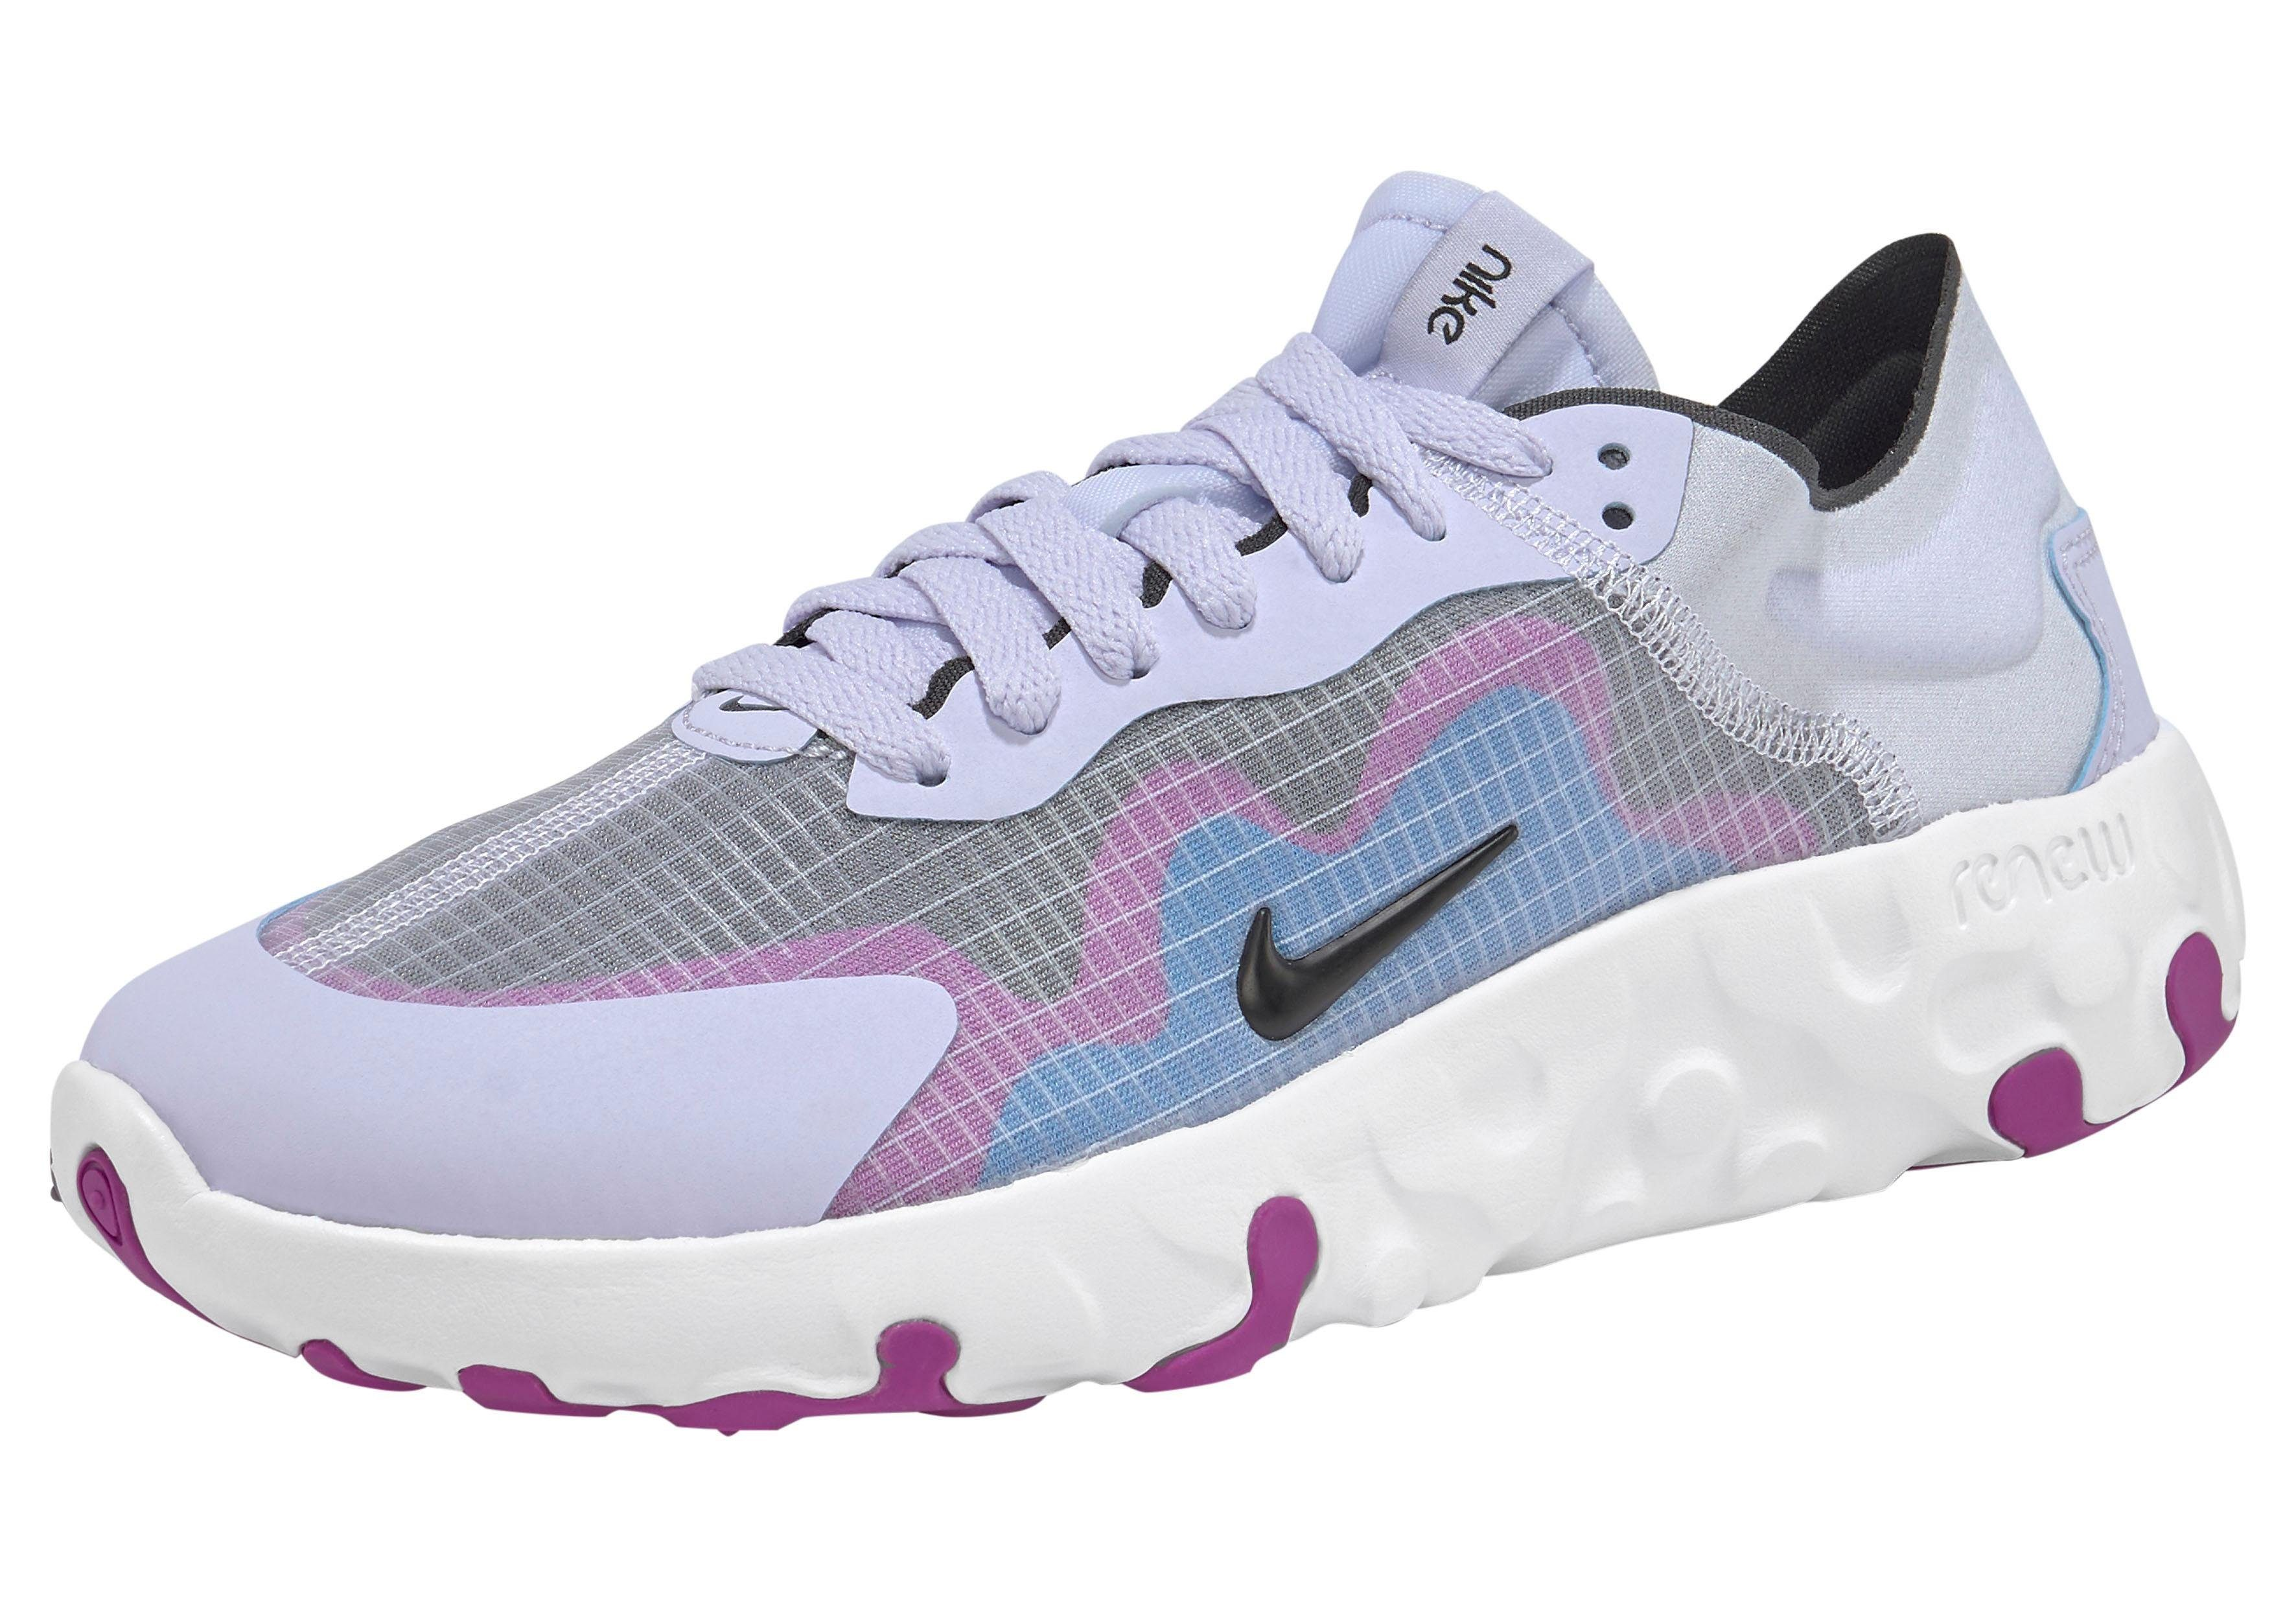 Bezahlbare Preise Romantisch Nike Air Max Thea Sneaker In